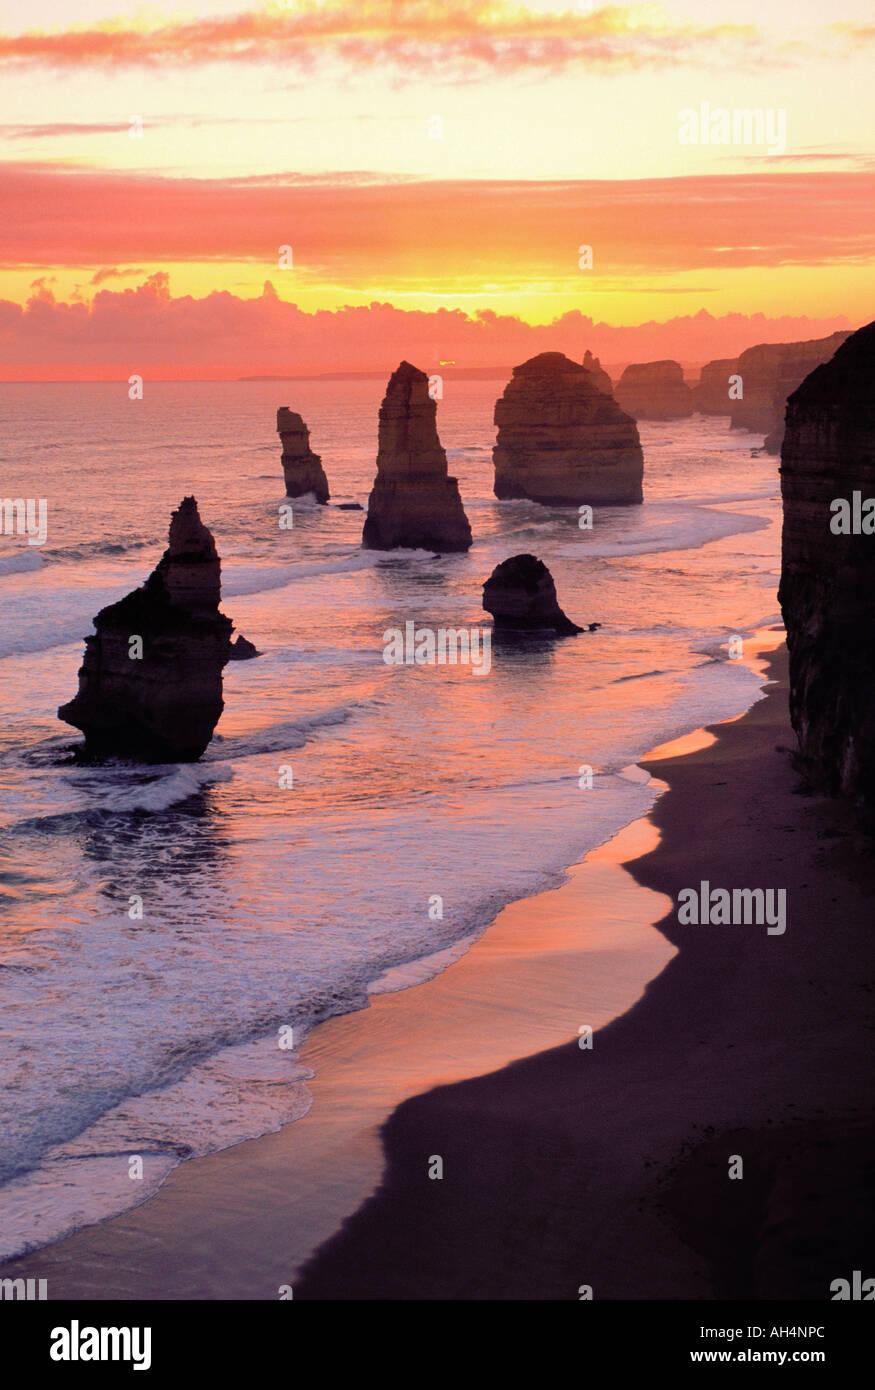 Die zwölf Apostel, Port Campbell National Park, Victoria, Australien Stockbild